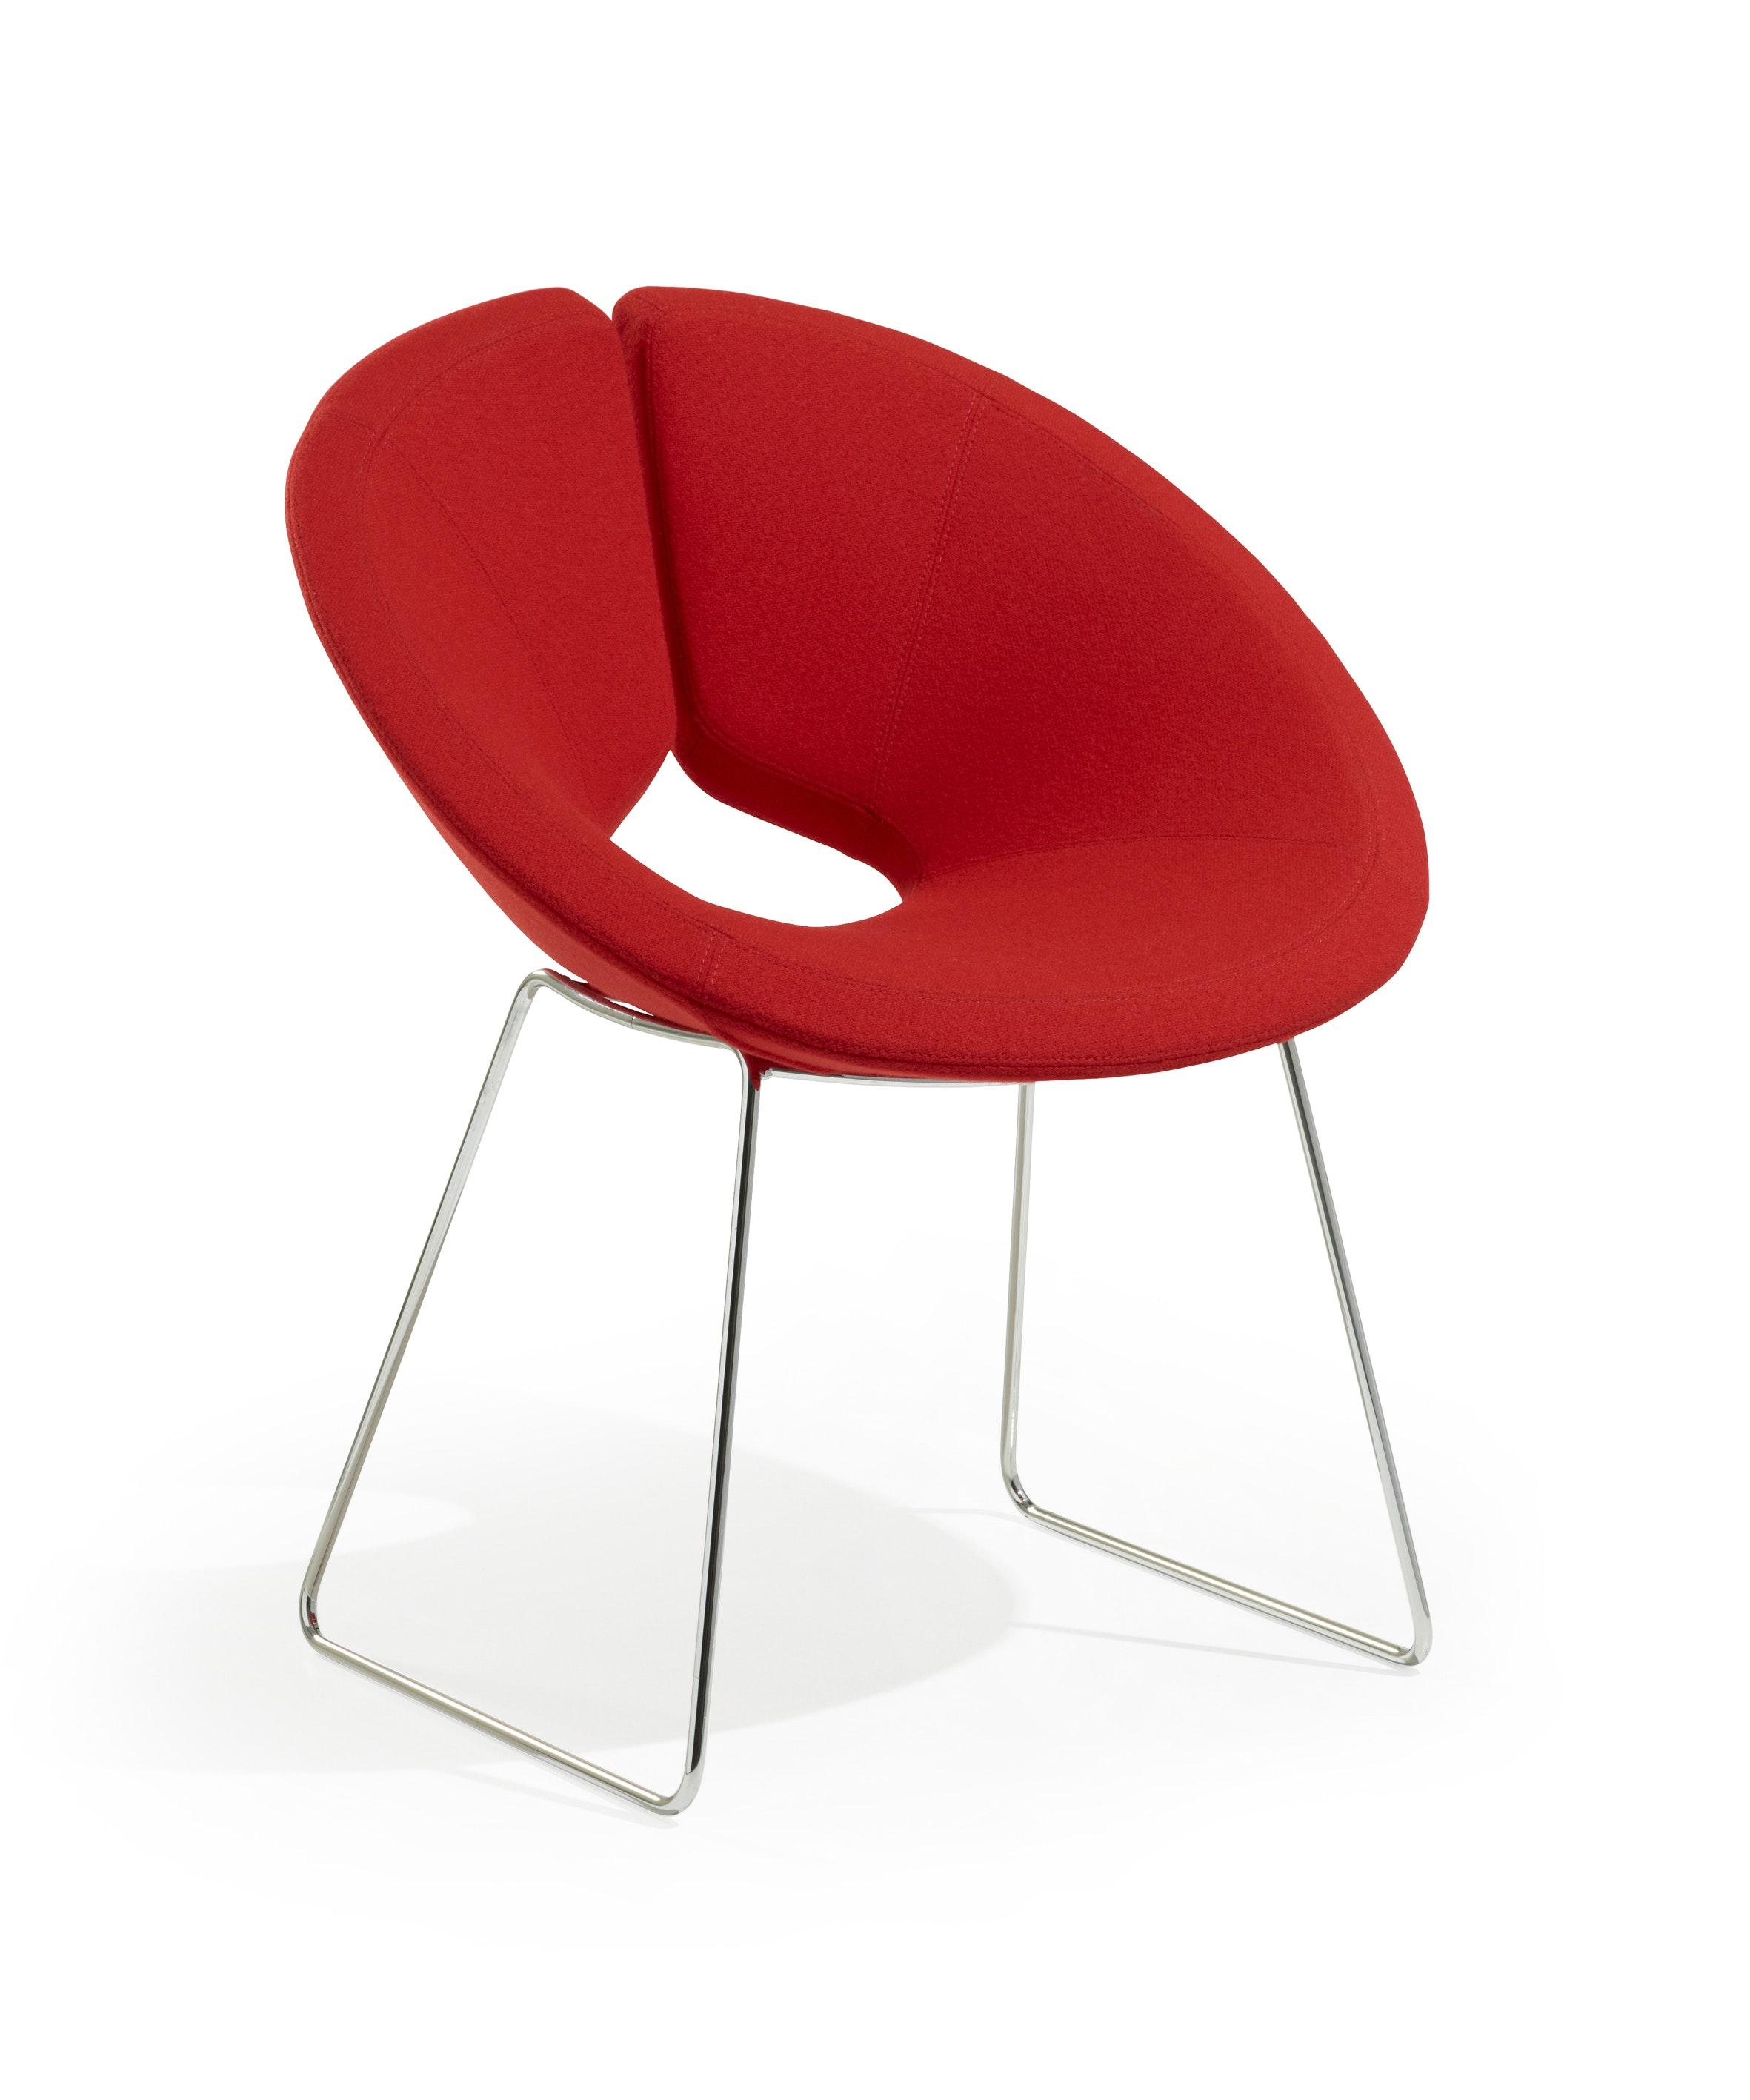 Little Apollo Chair 4